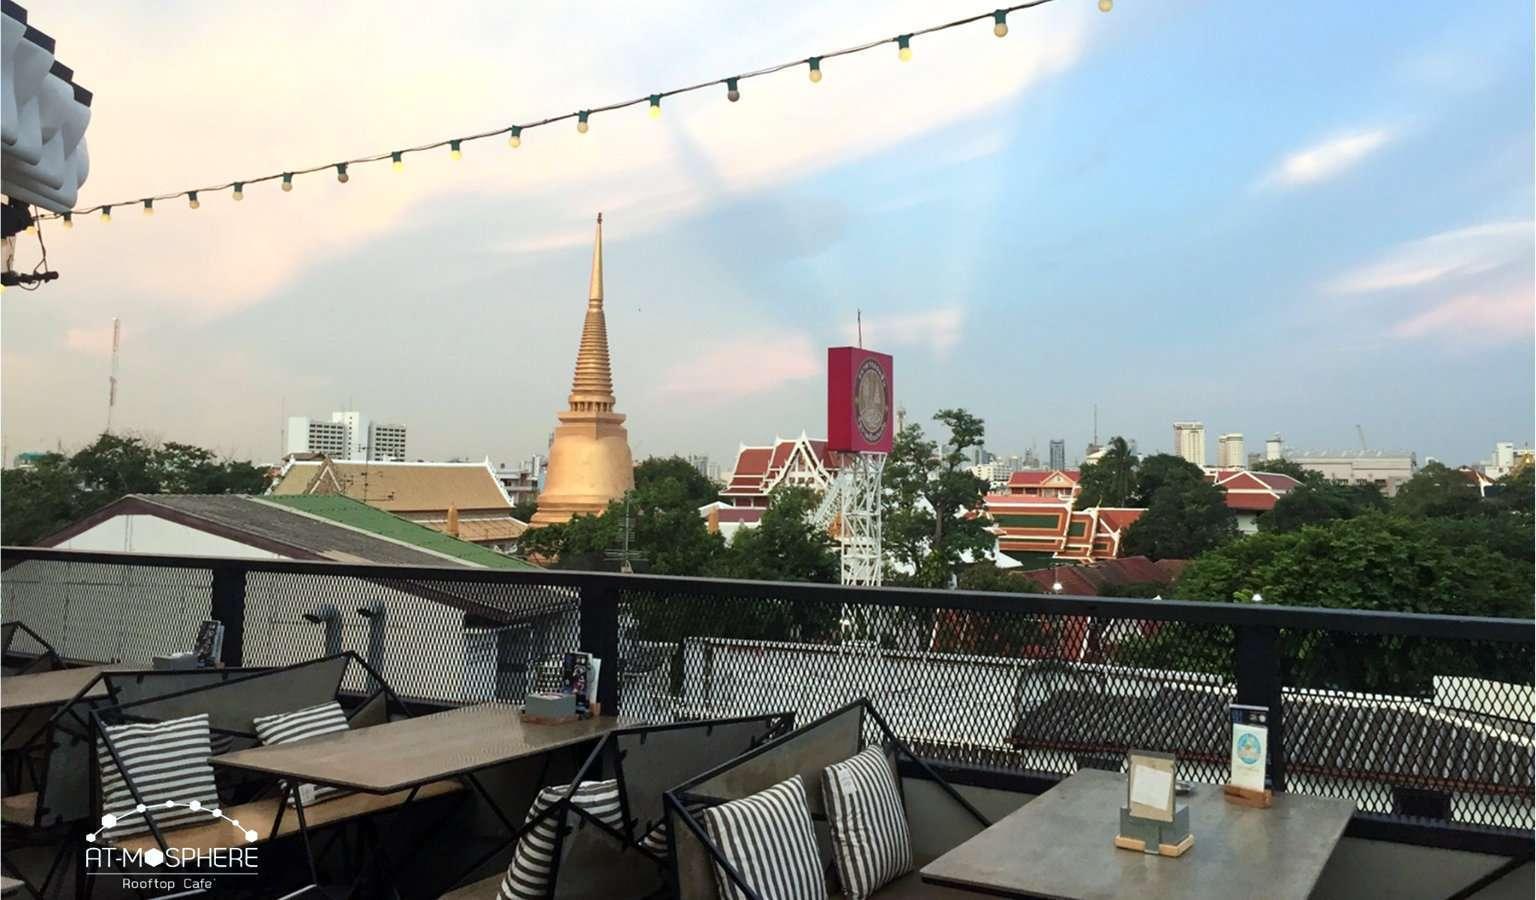 Uitzicht op de Wat Bowonniwet vanaf At-Mosphere Rooftop Cafe in Bangkok, Thailand